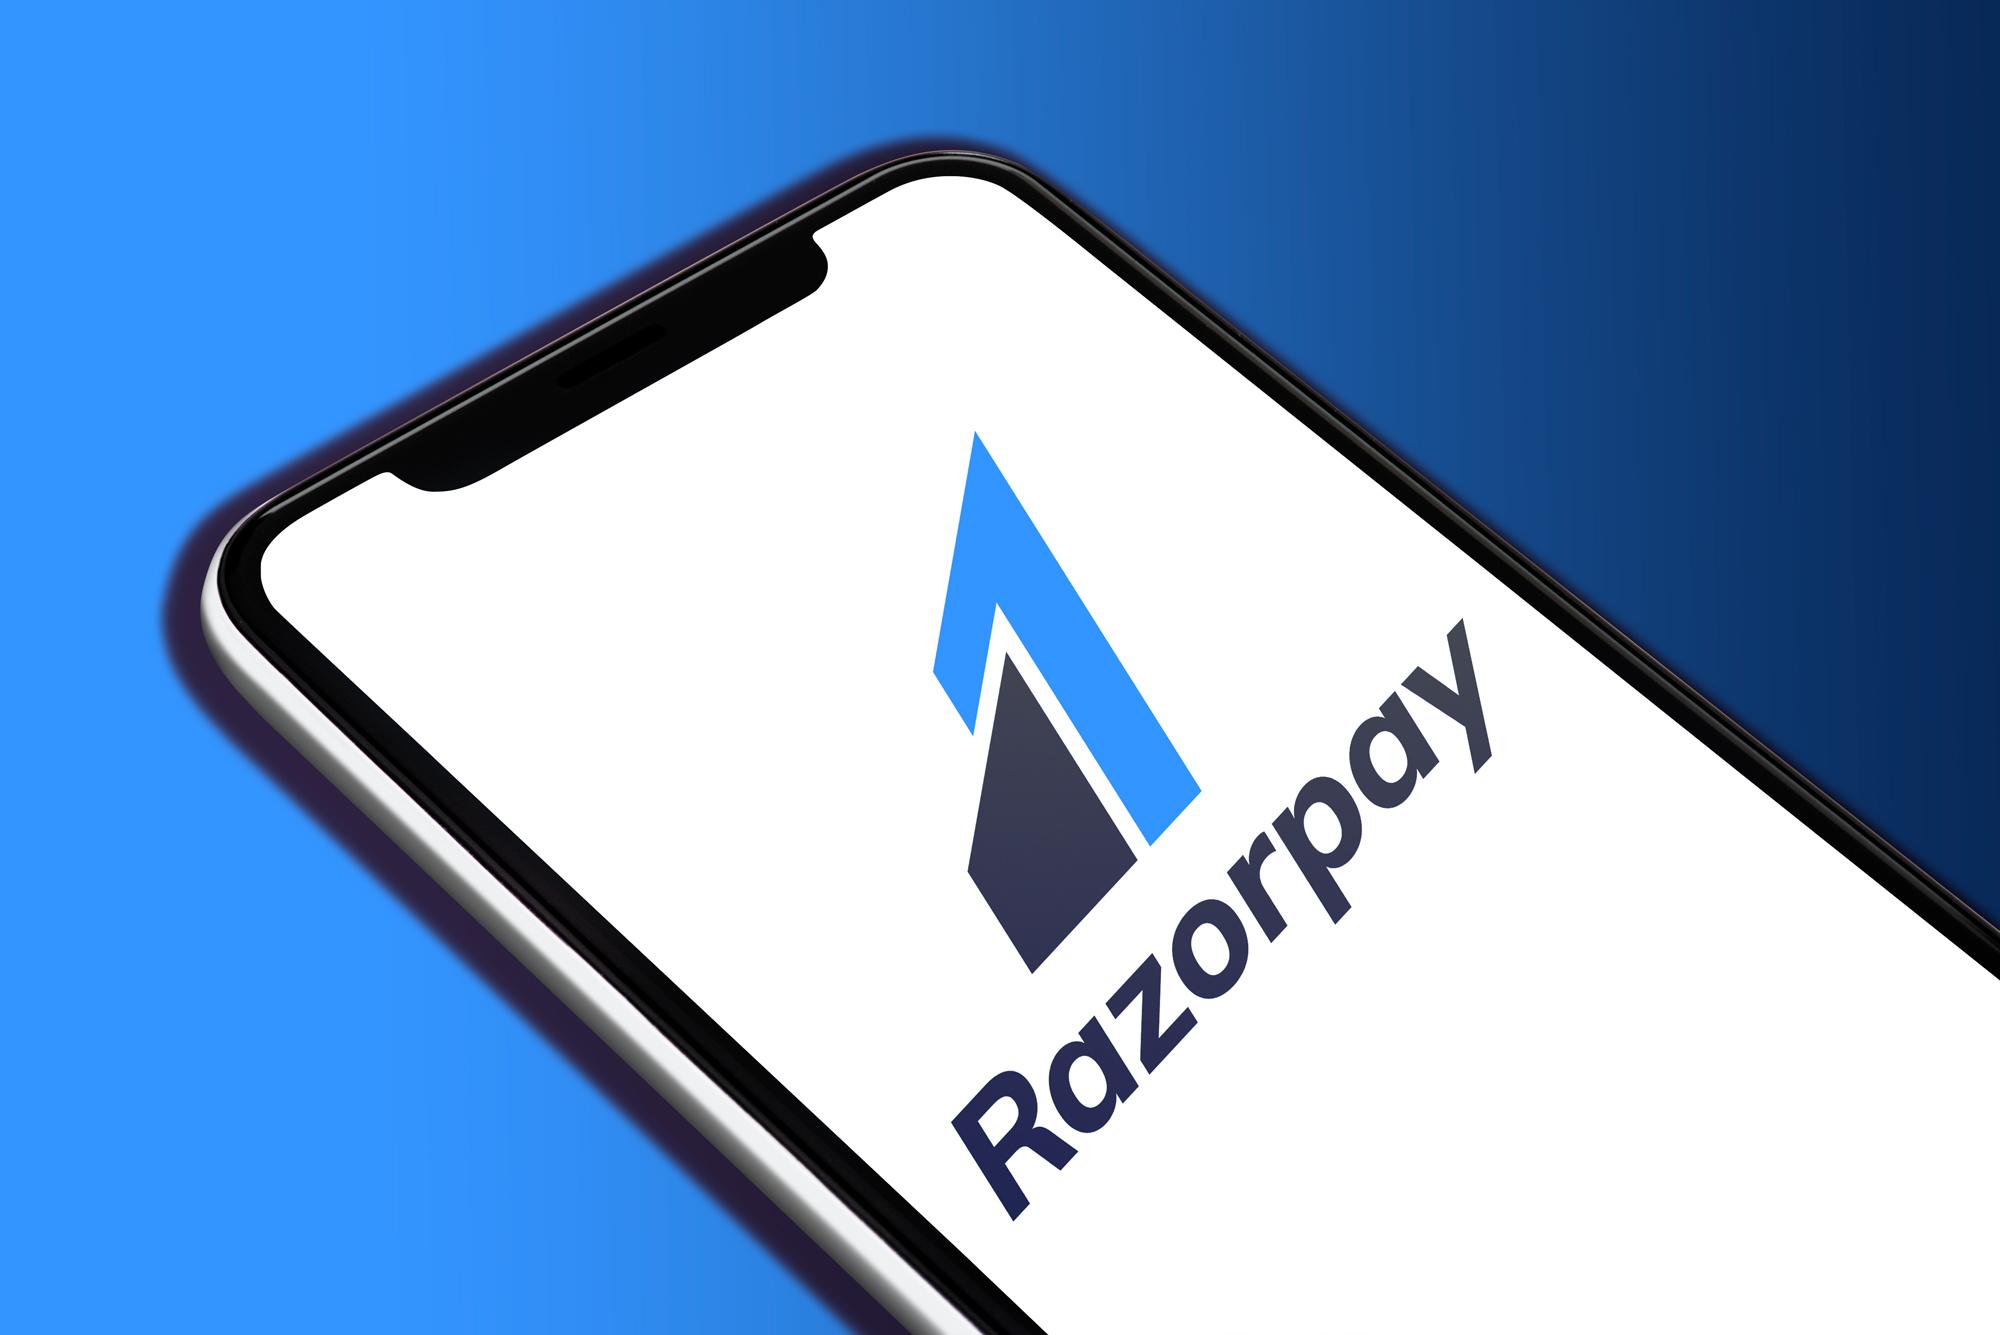 Razorpay logo displayed on a White smartphone